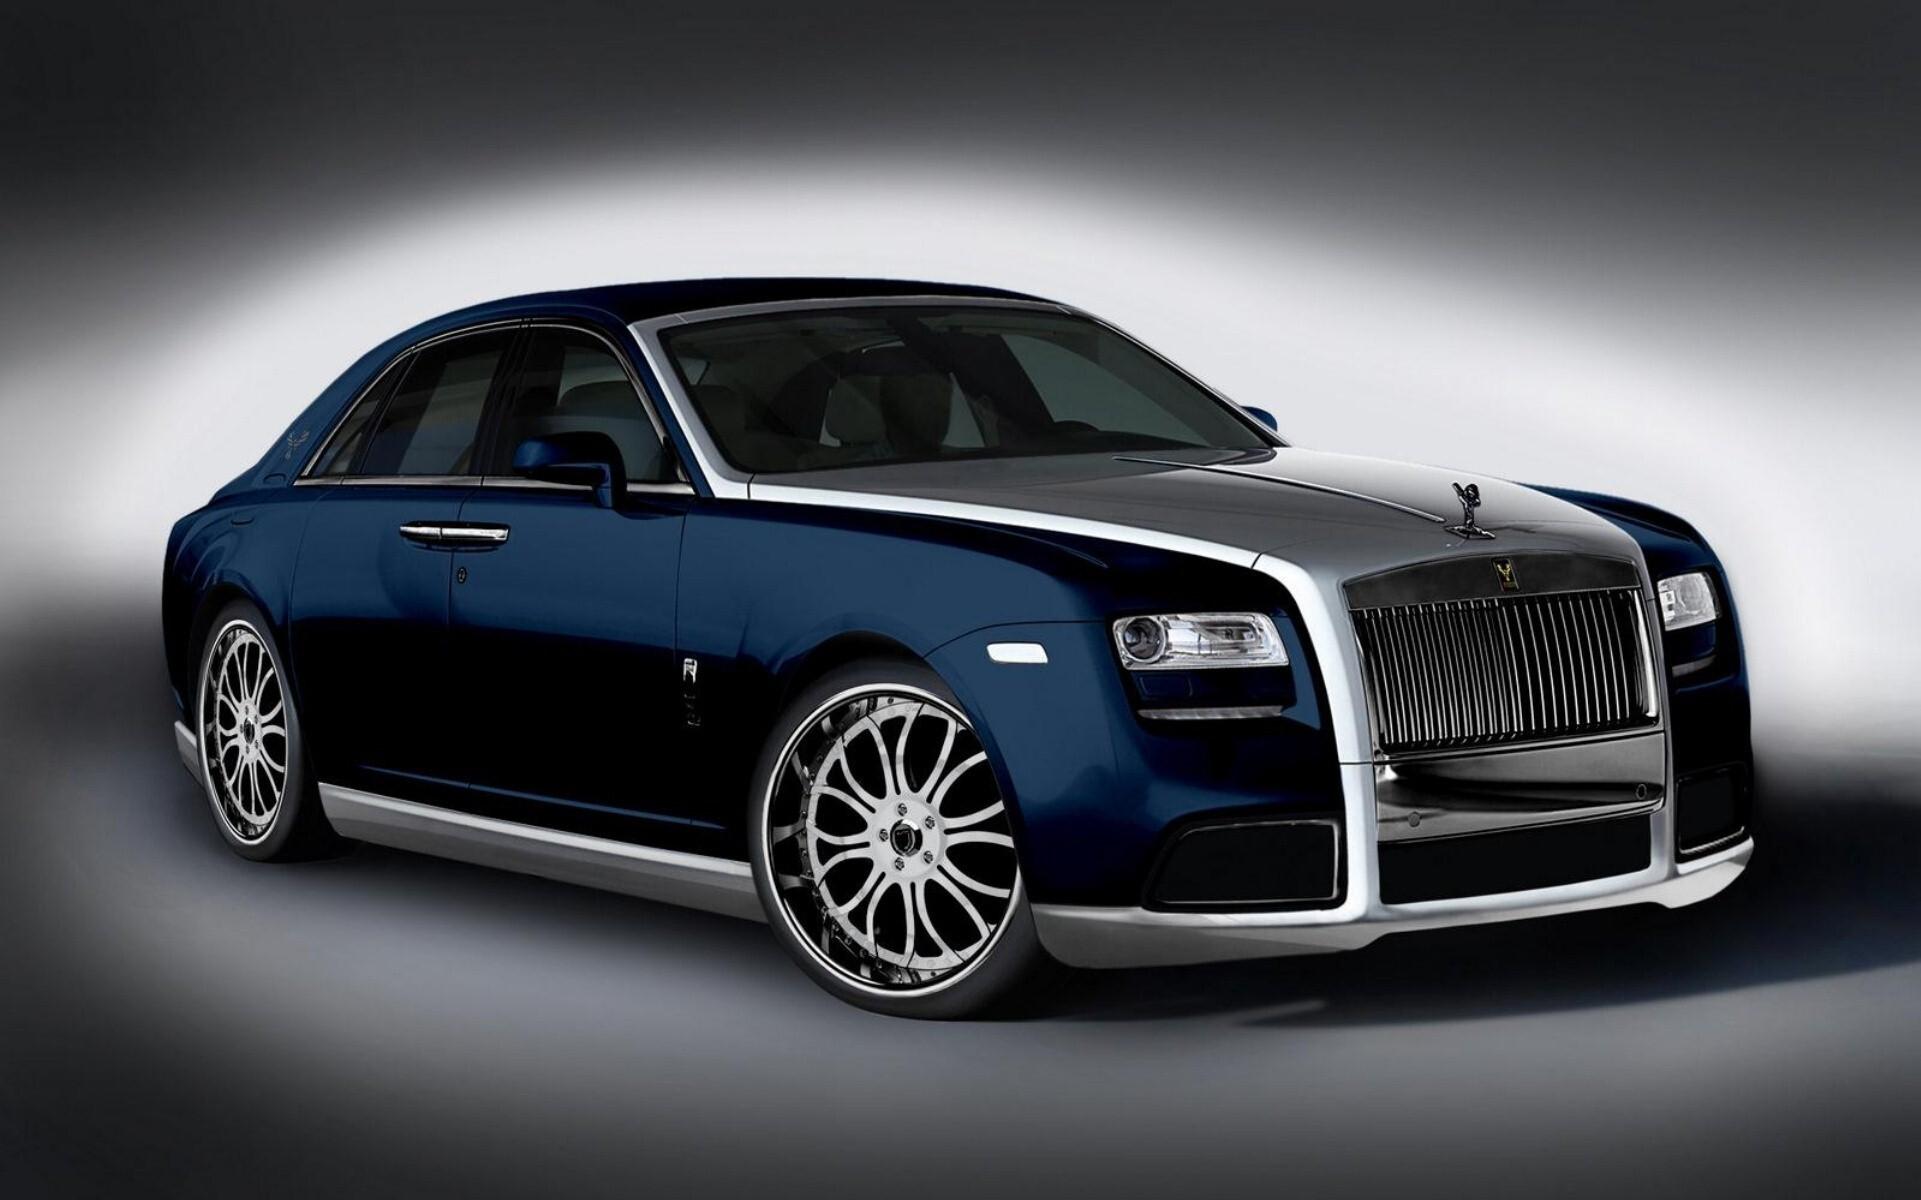 Blue Silver Rolls Royce Car Wallpapers Hd Wallpapers